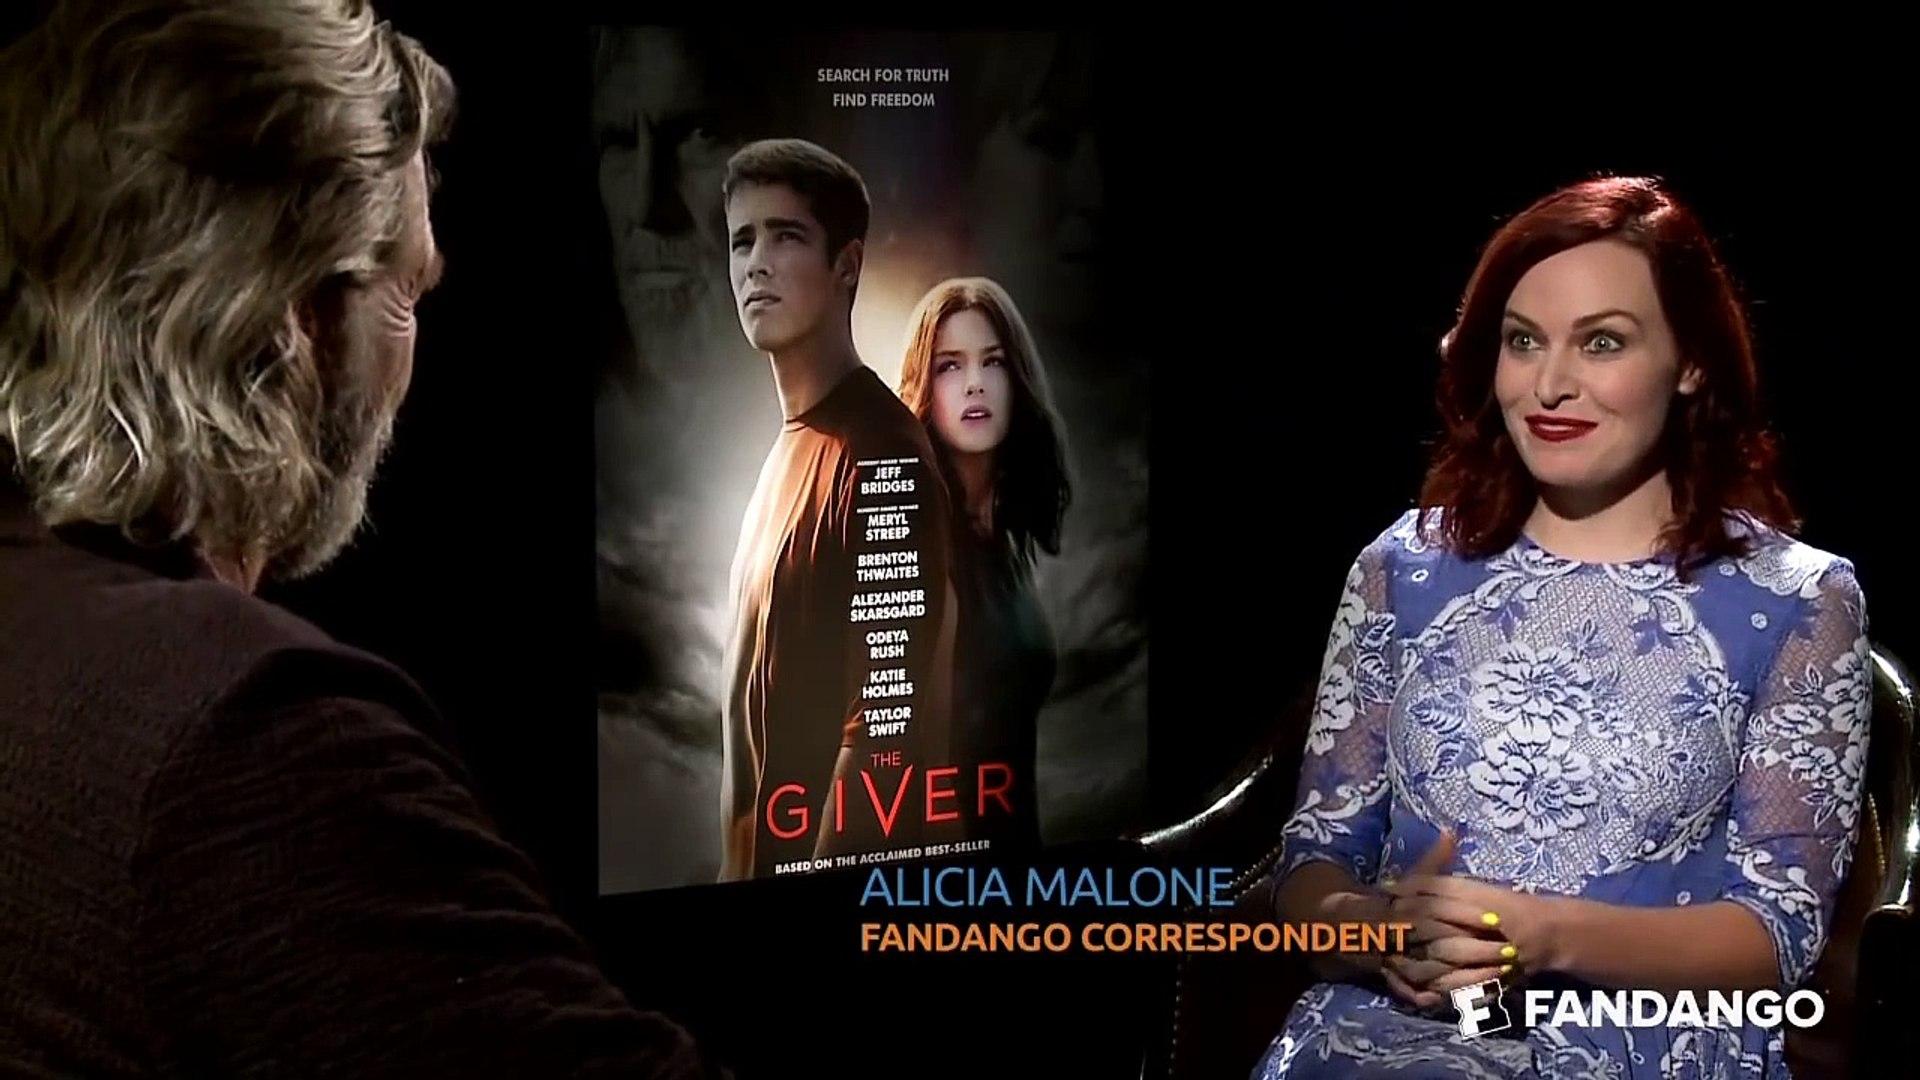 The Giver Cast Interview | Celebrity Interviews | FandangoMovies